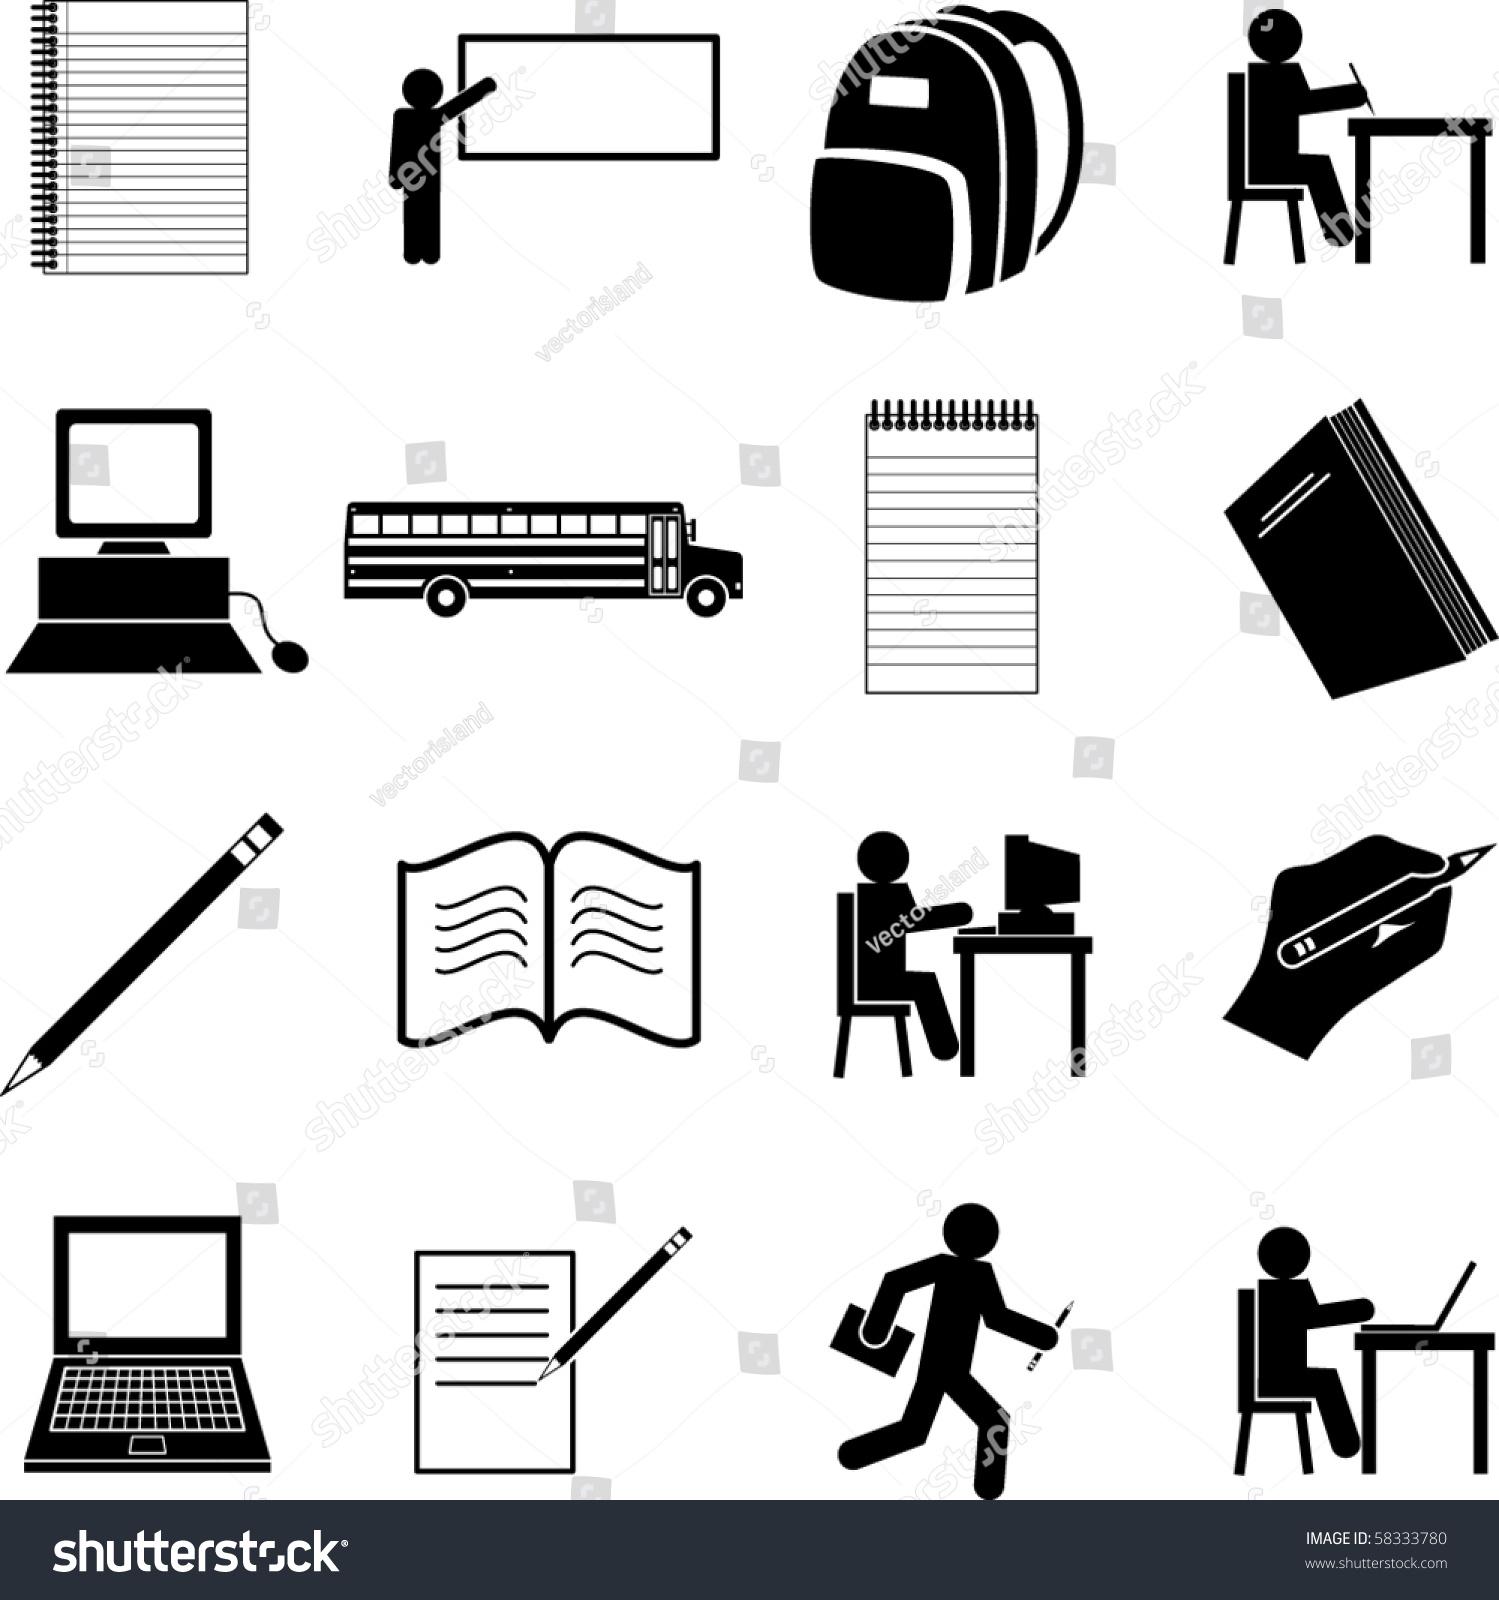 School symbols set stock vector 58333780 shutterstock school symbols set buycottarizona Image collections